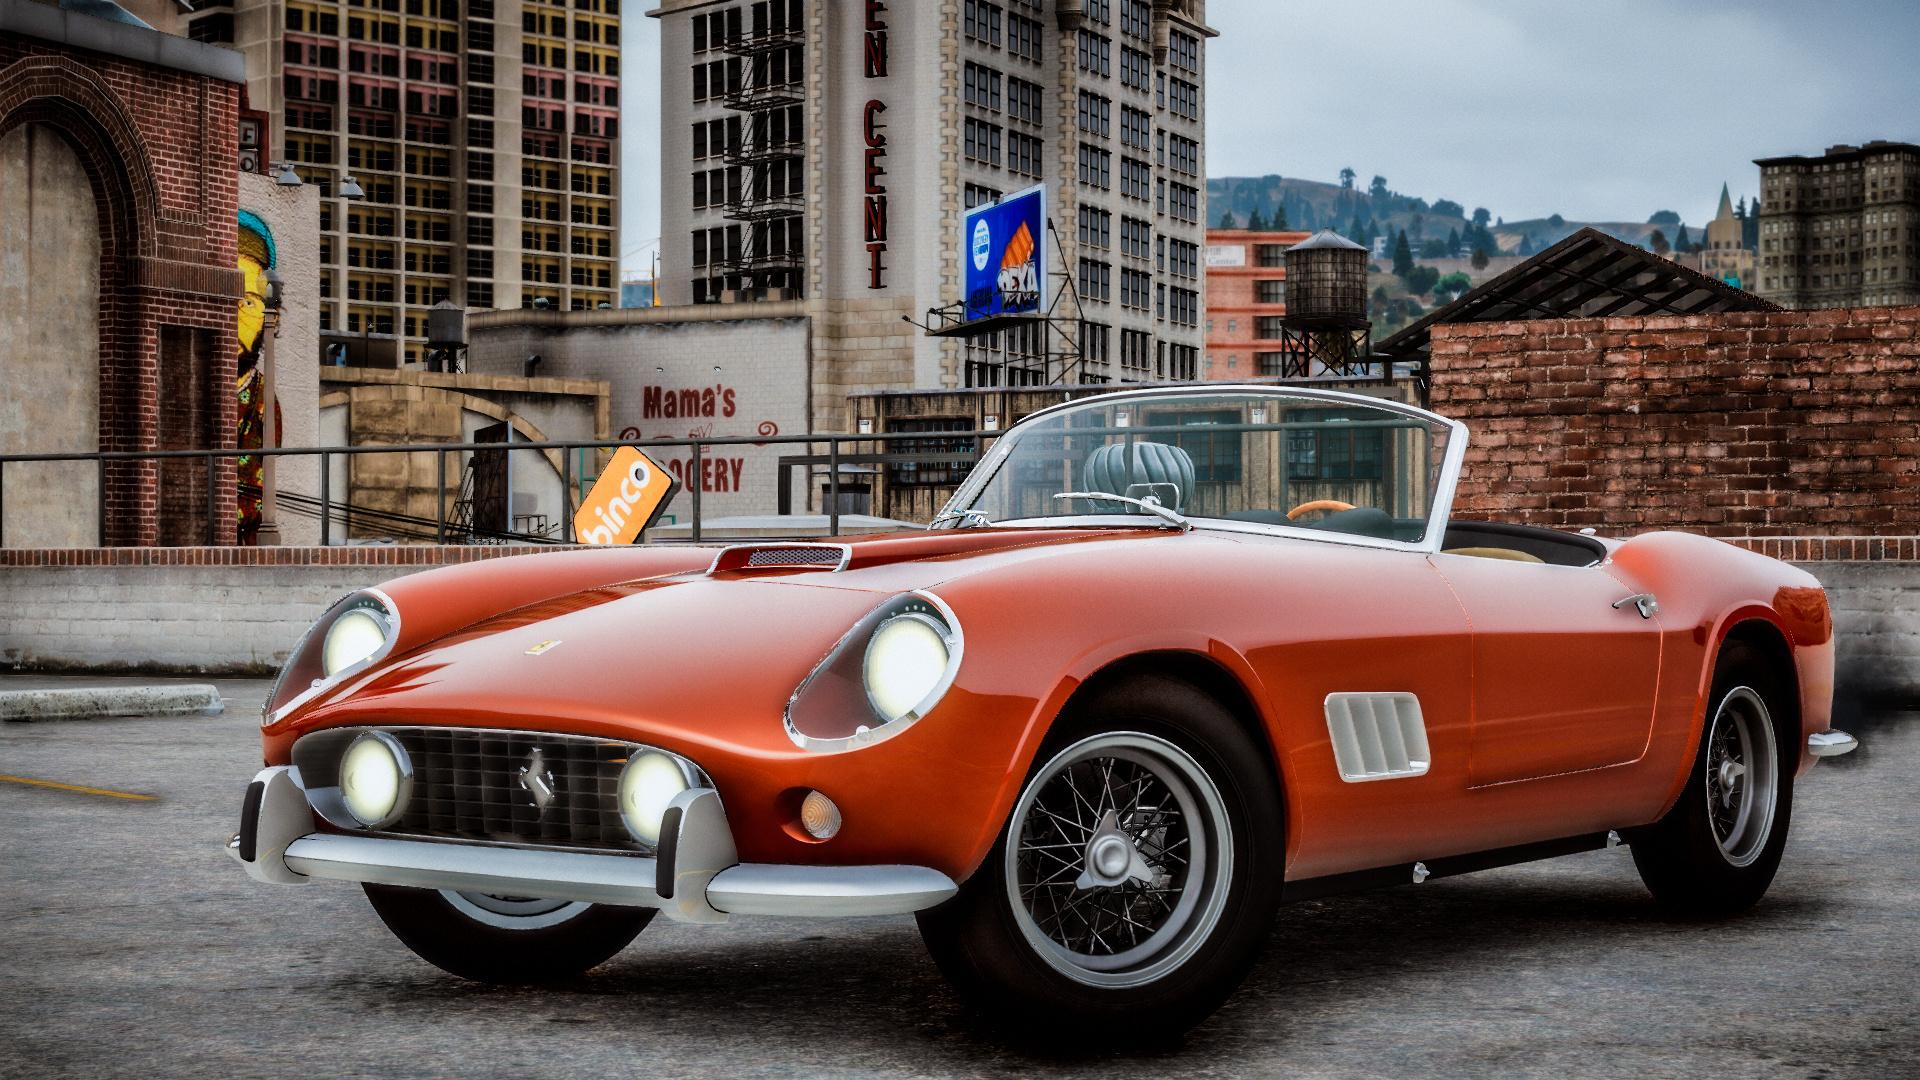 1957 Ferrari 250 Gt California Spyder Lwb Add On Lods Template Gta5 Mods Com